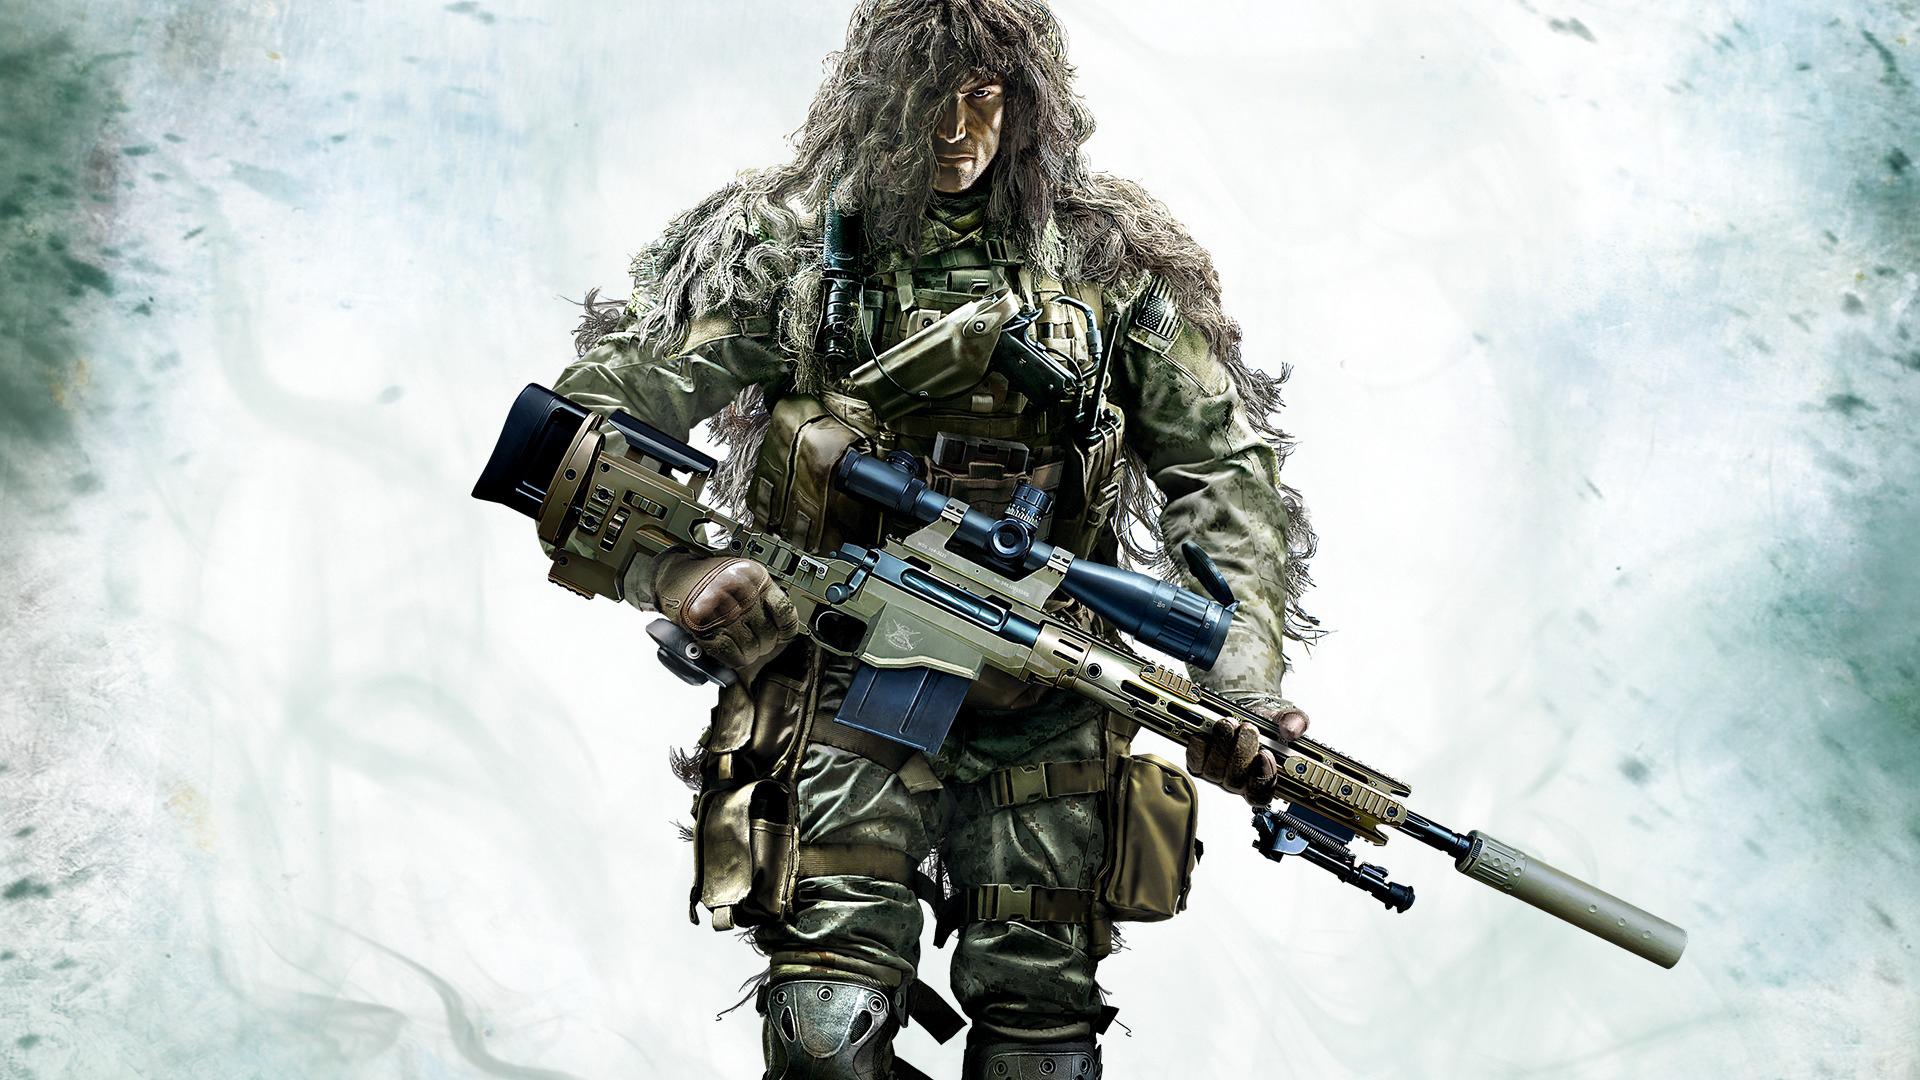 sniper wallpaper 889268 sniper wallpaper 889292 sniper wallpaper 1920x1080